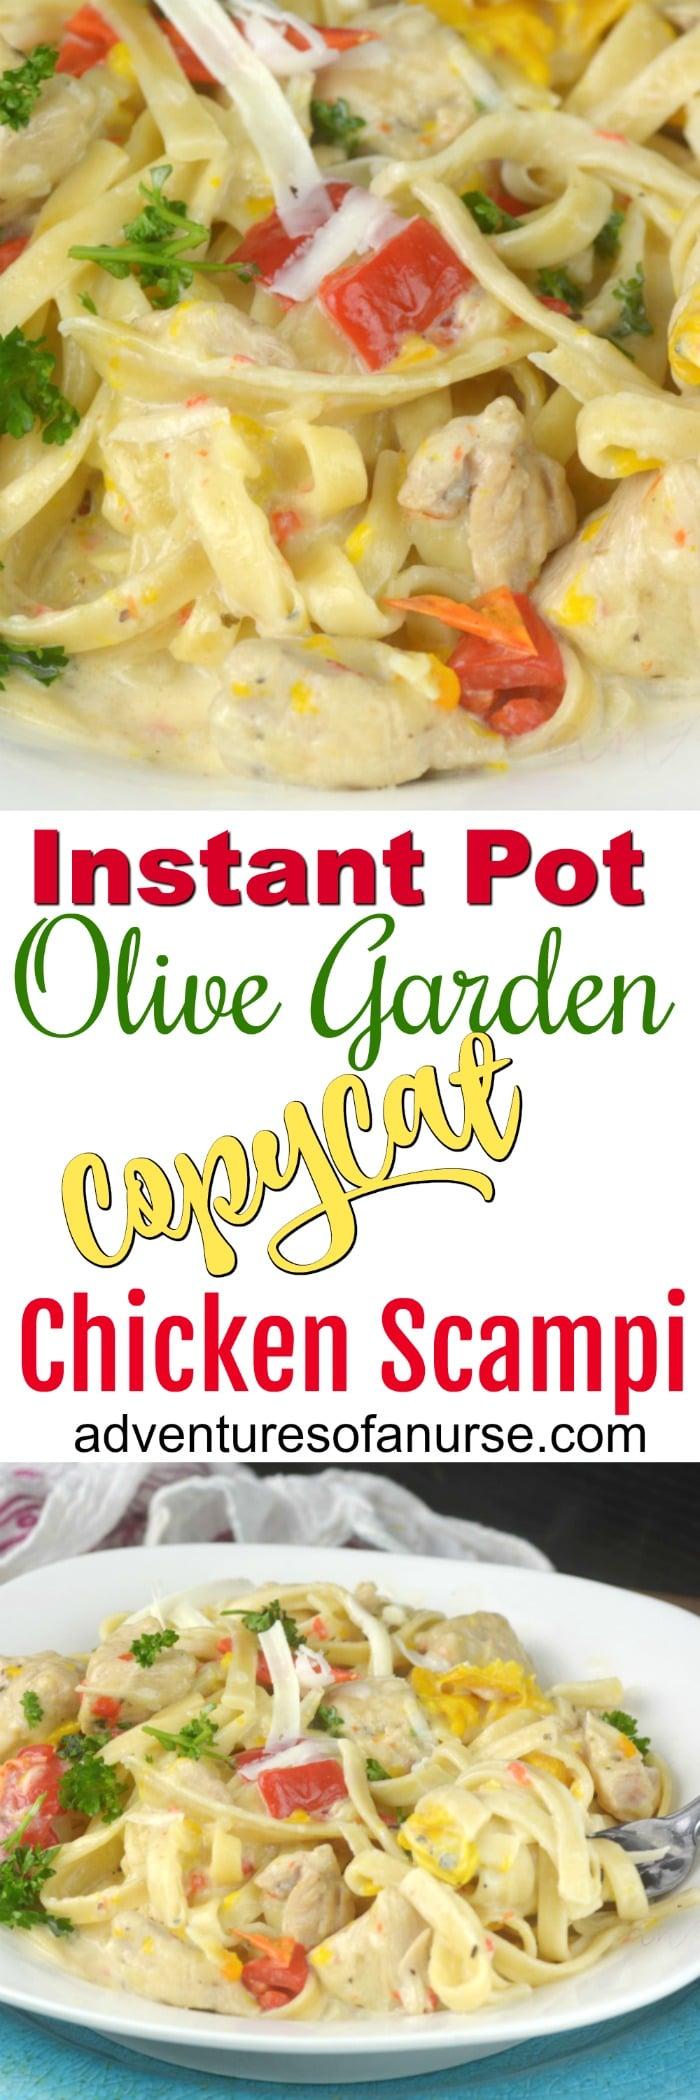 Instant Pot Olive Garden Copy Cat Chicken Scampi Recipe